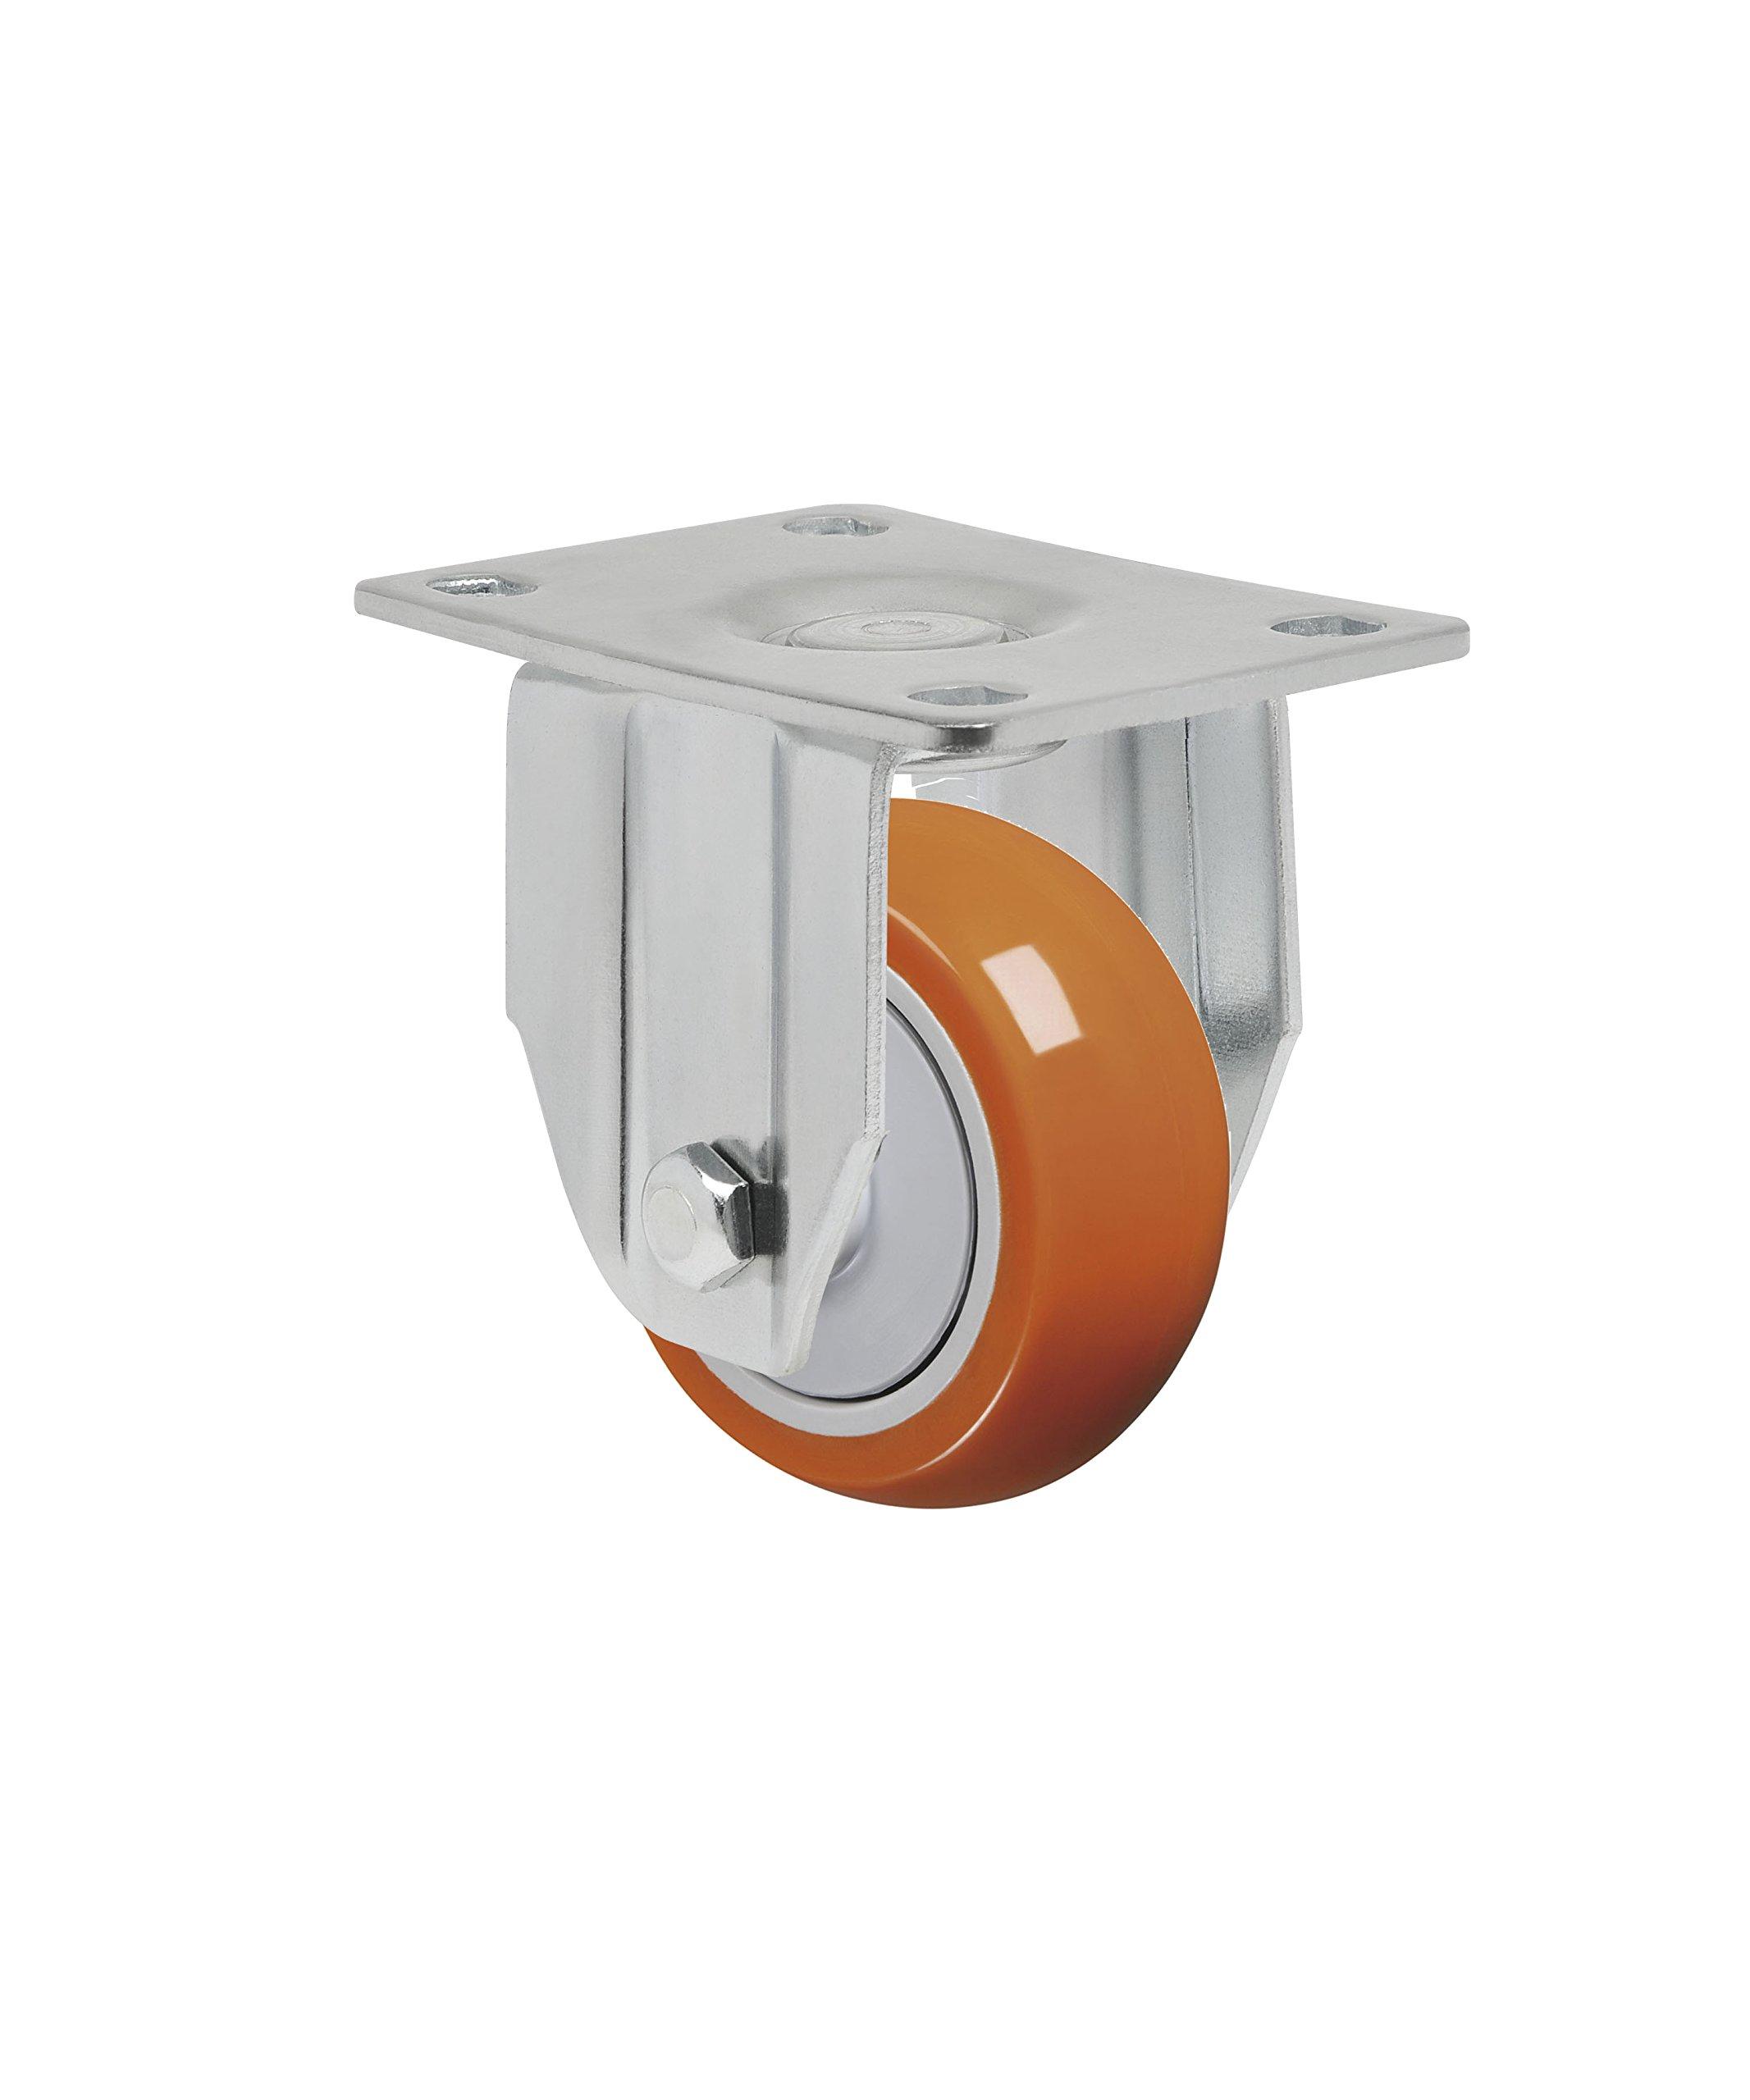 Schioppa L12 Series, FLA 312 UPE, 3 x 1-1/4'' Rigid Caster, Non-Marking Polyurethane Precision Ball Bearing Wheel, 175 lbs, Plate 3-3/4 x 2-1/2'' (Bolt Holes 3 x 1-3/4'')